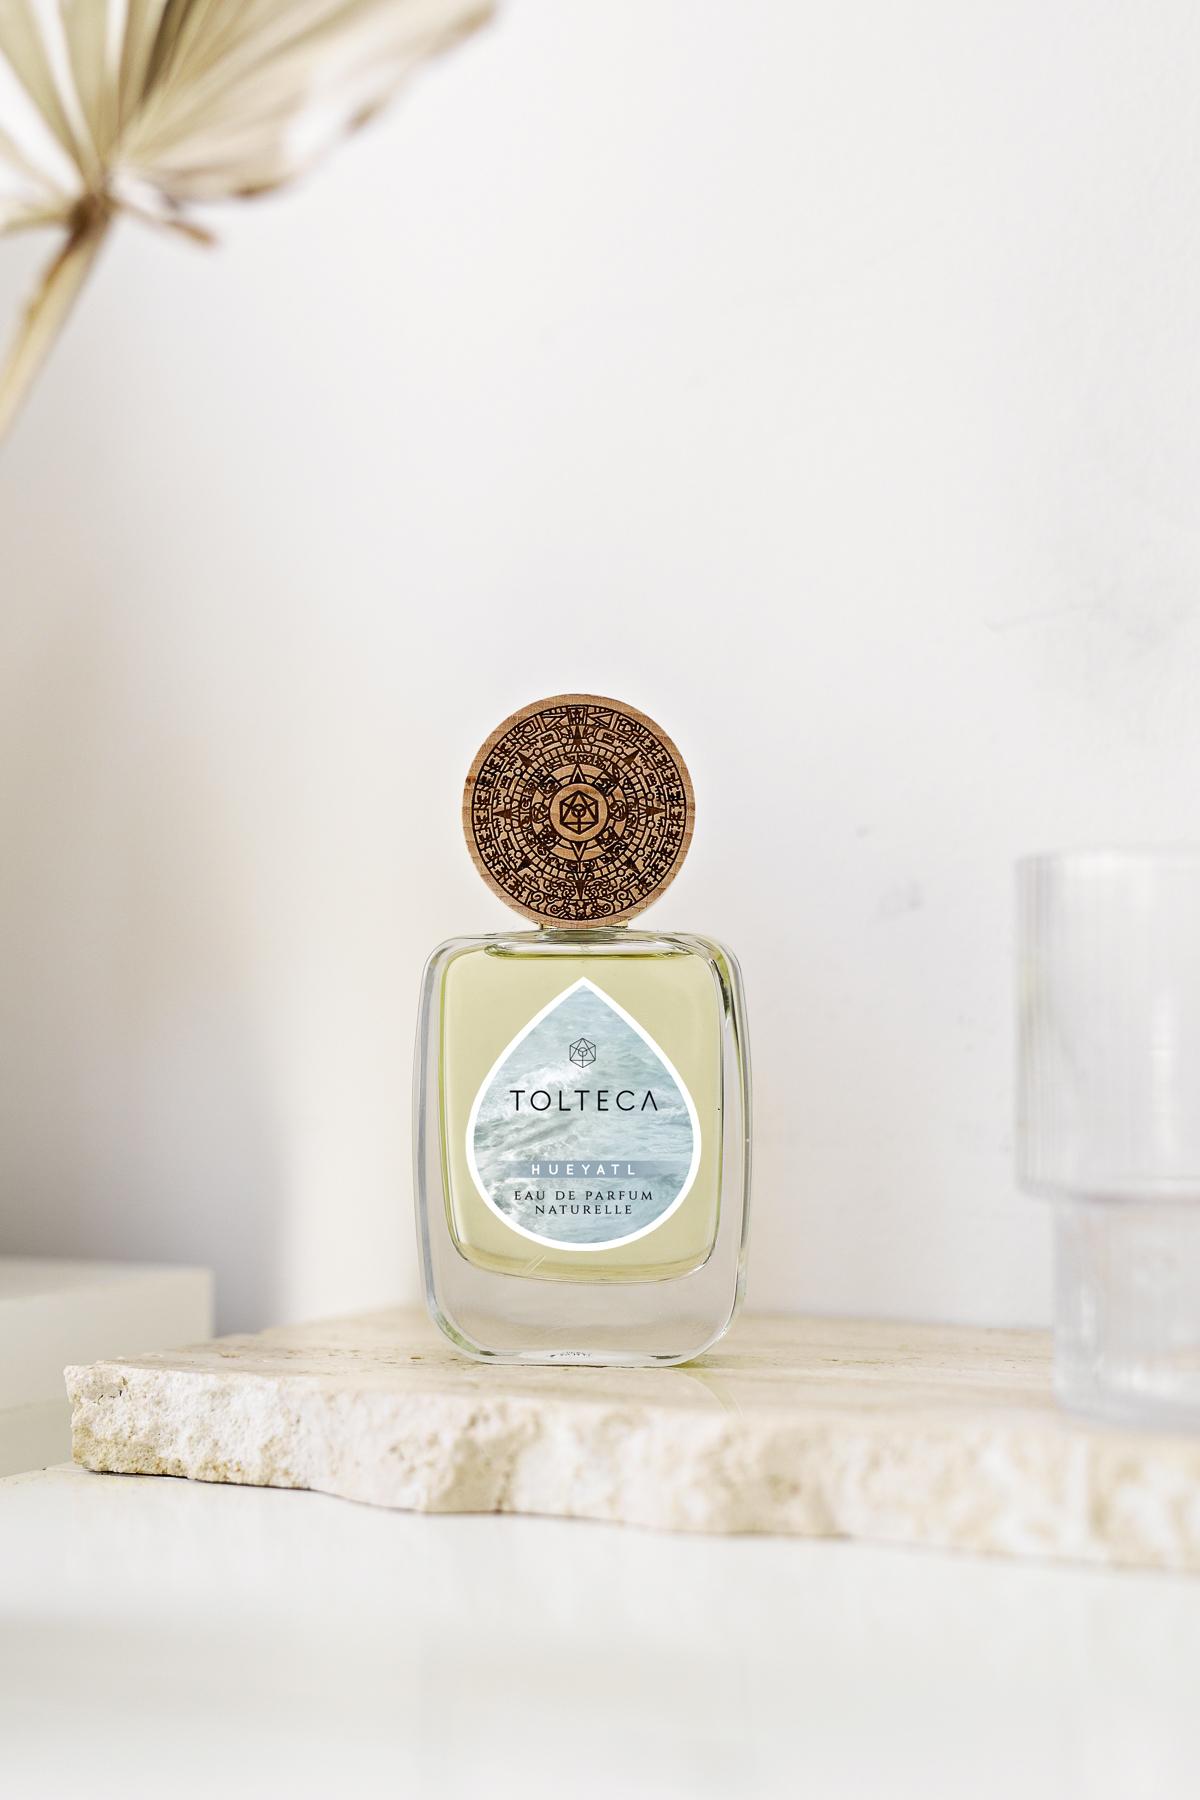 Tolteca parfum hueyatl